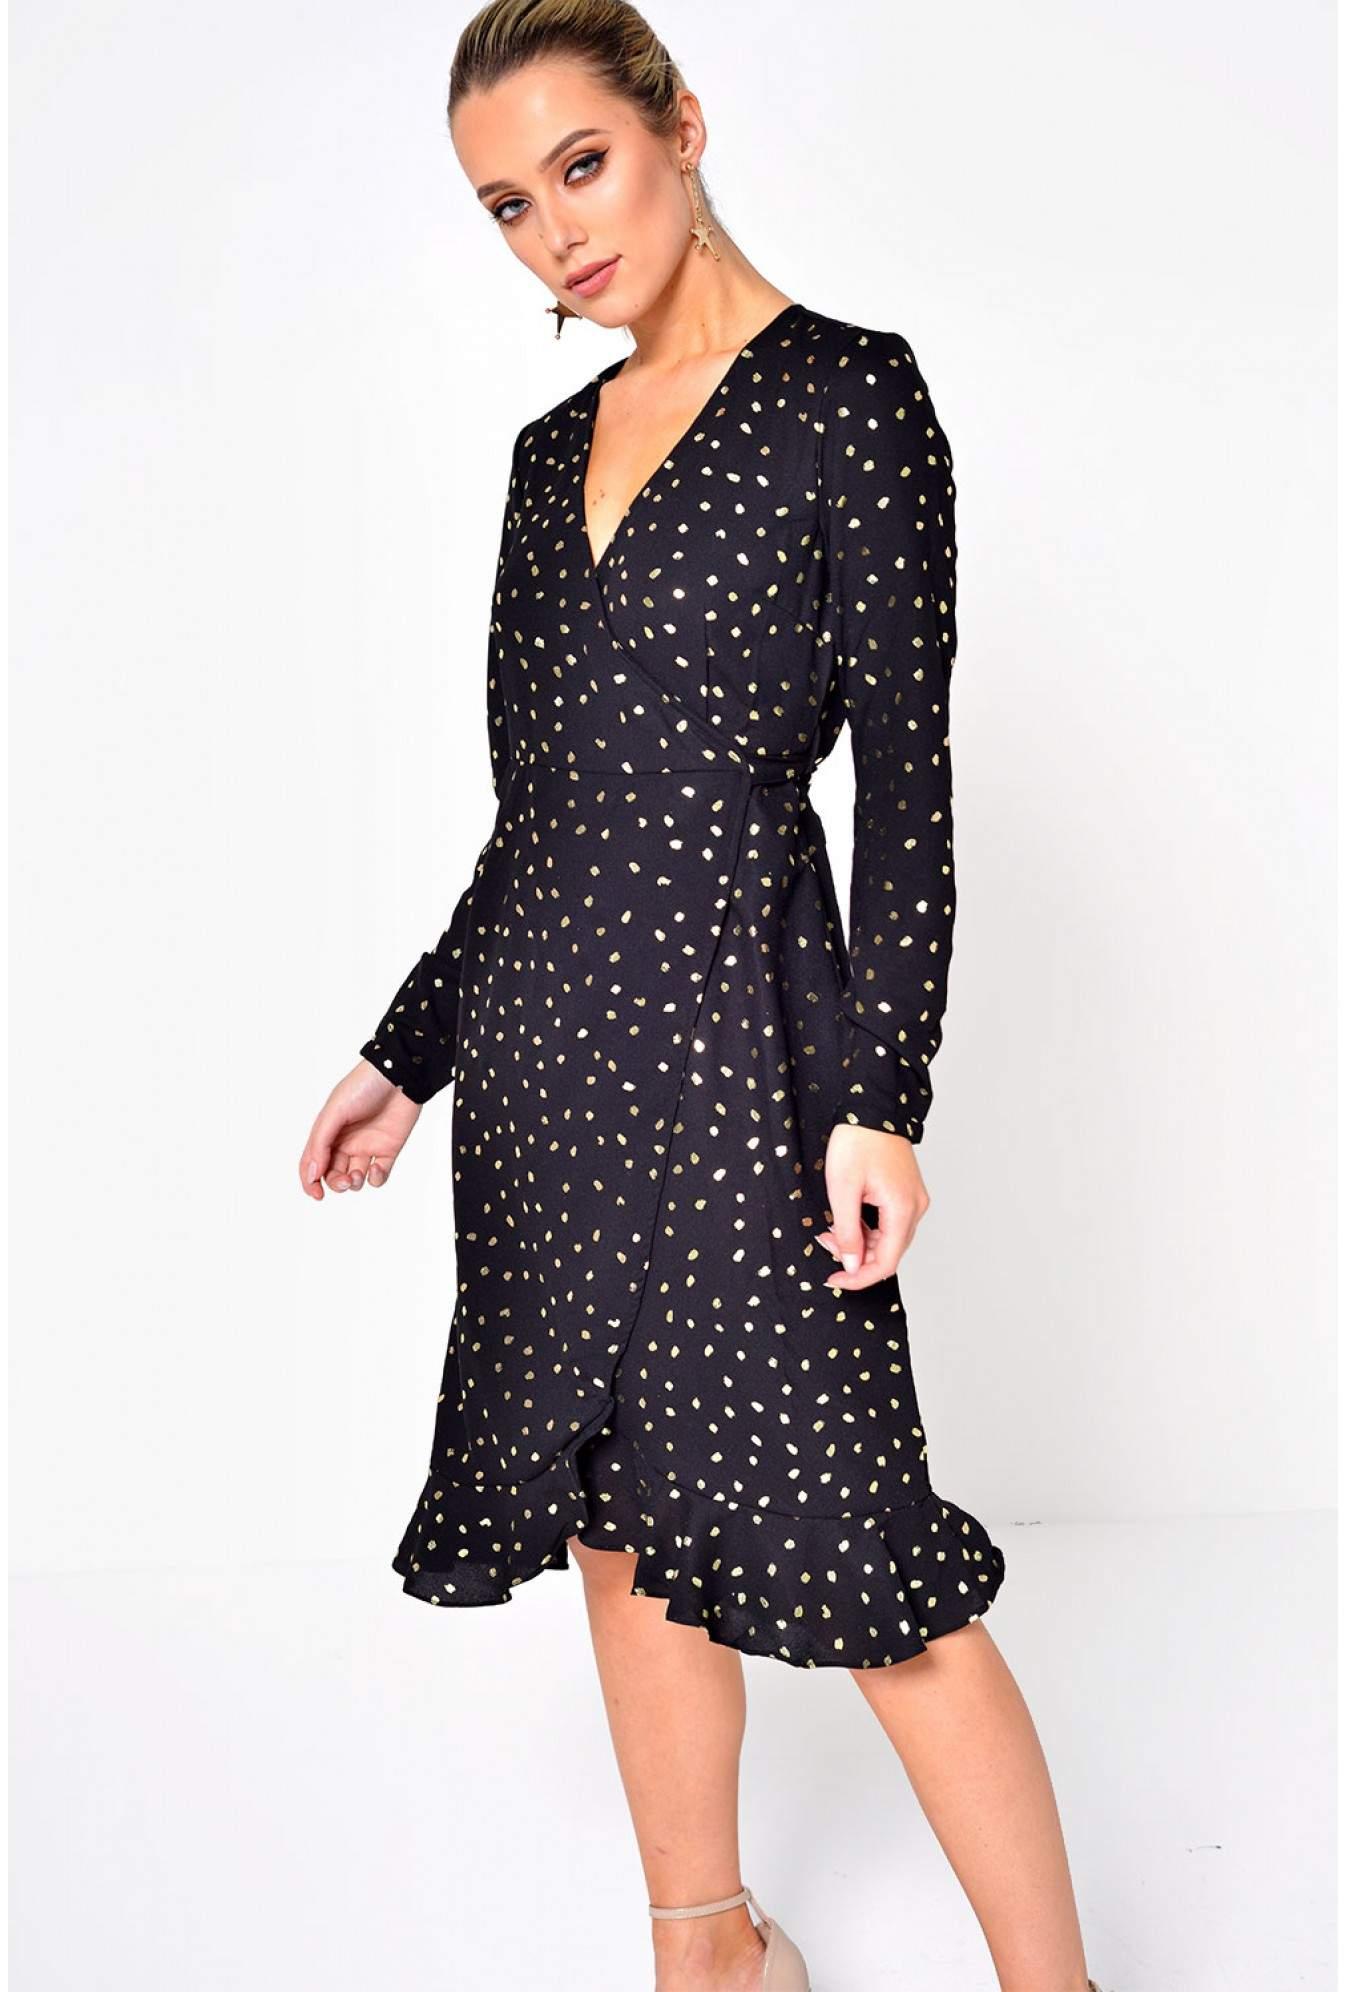 b4f80c788aca Vero Moda Henna Dot Foil Wrap Dress in Black